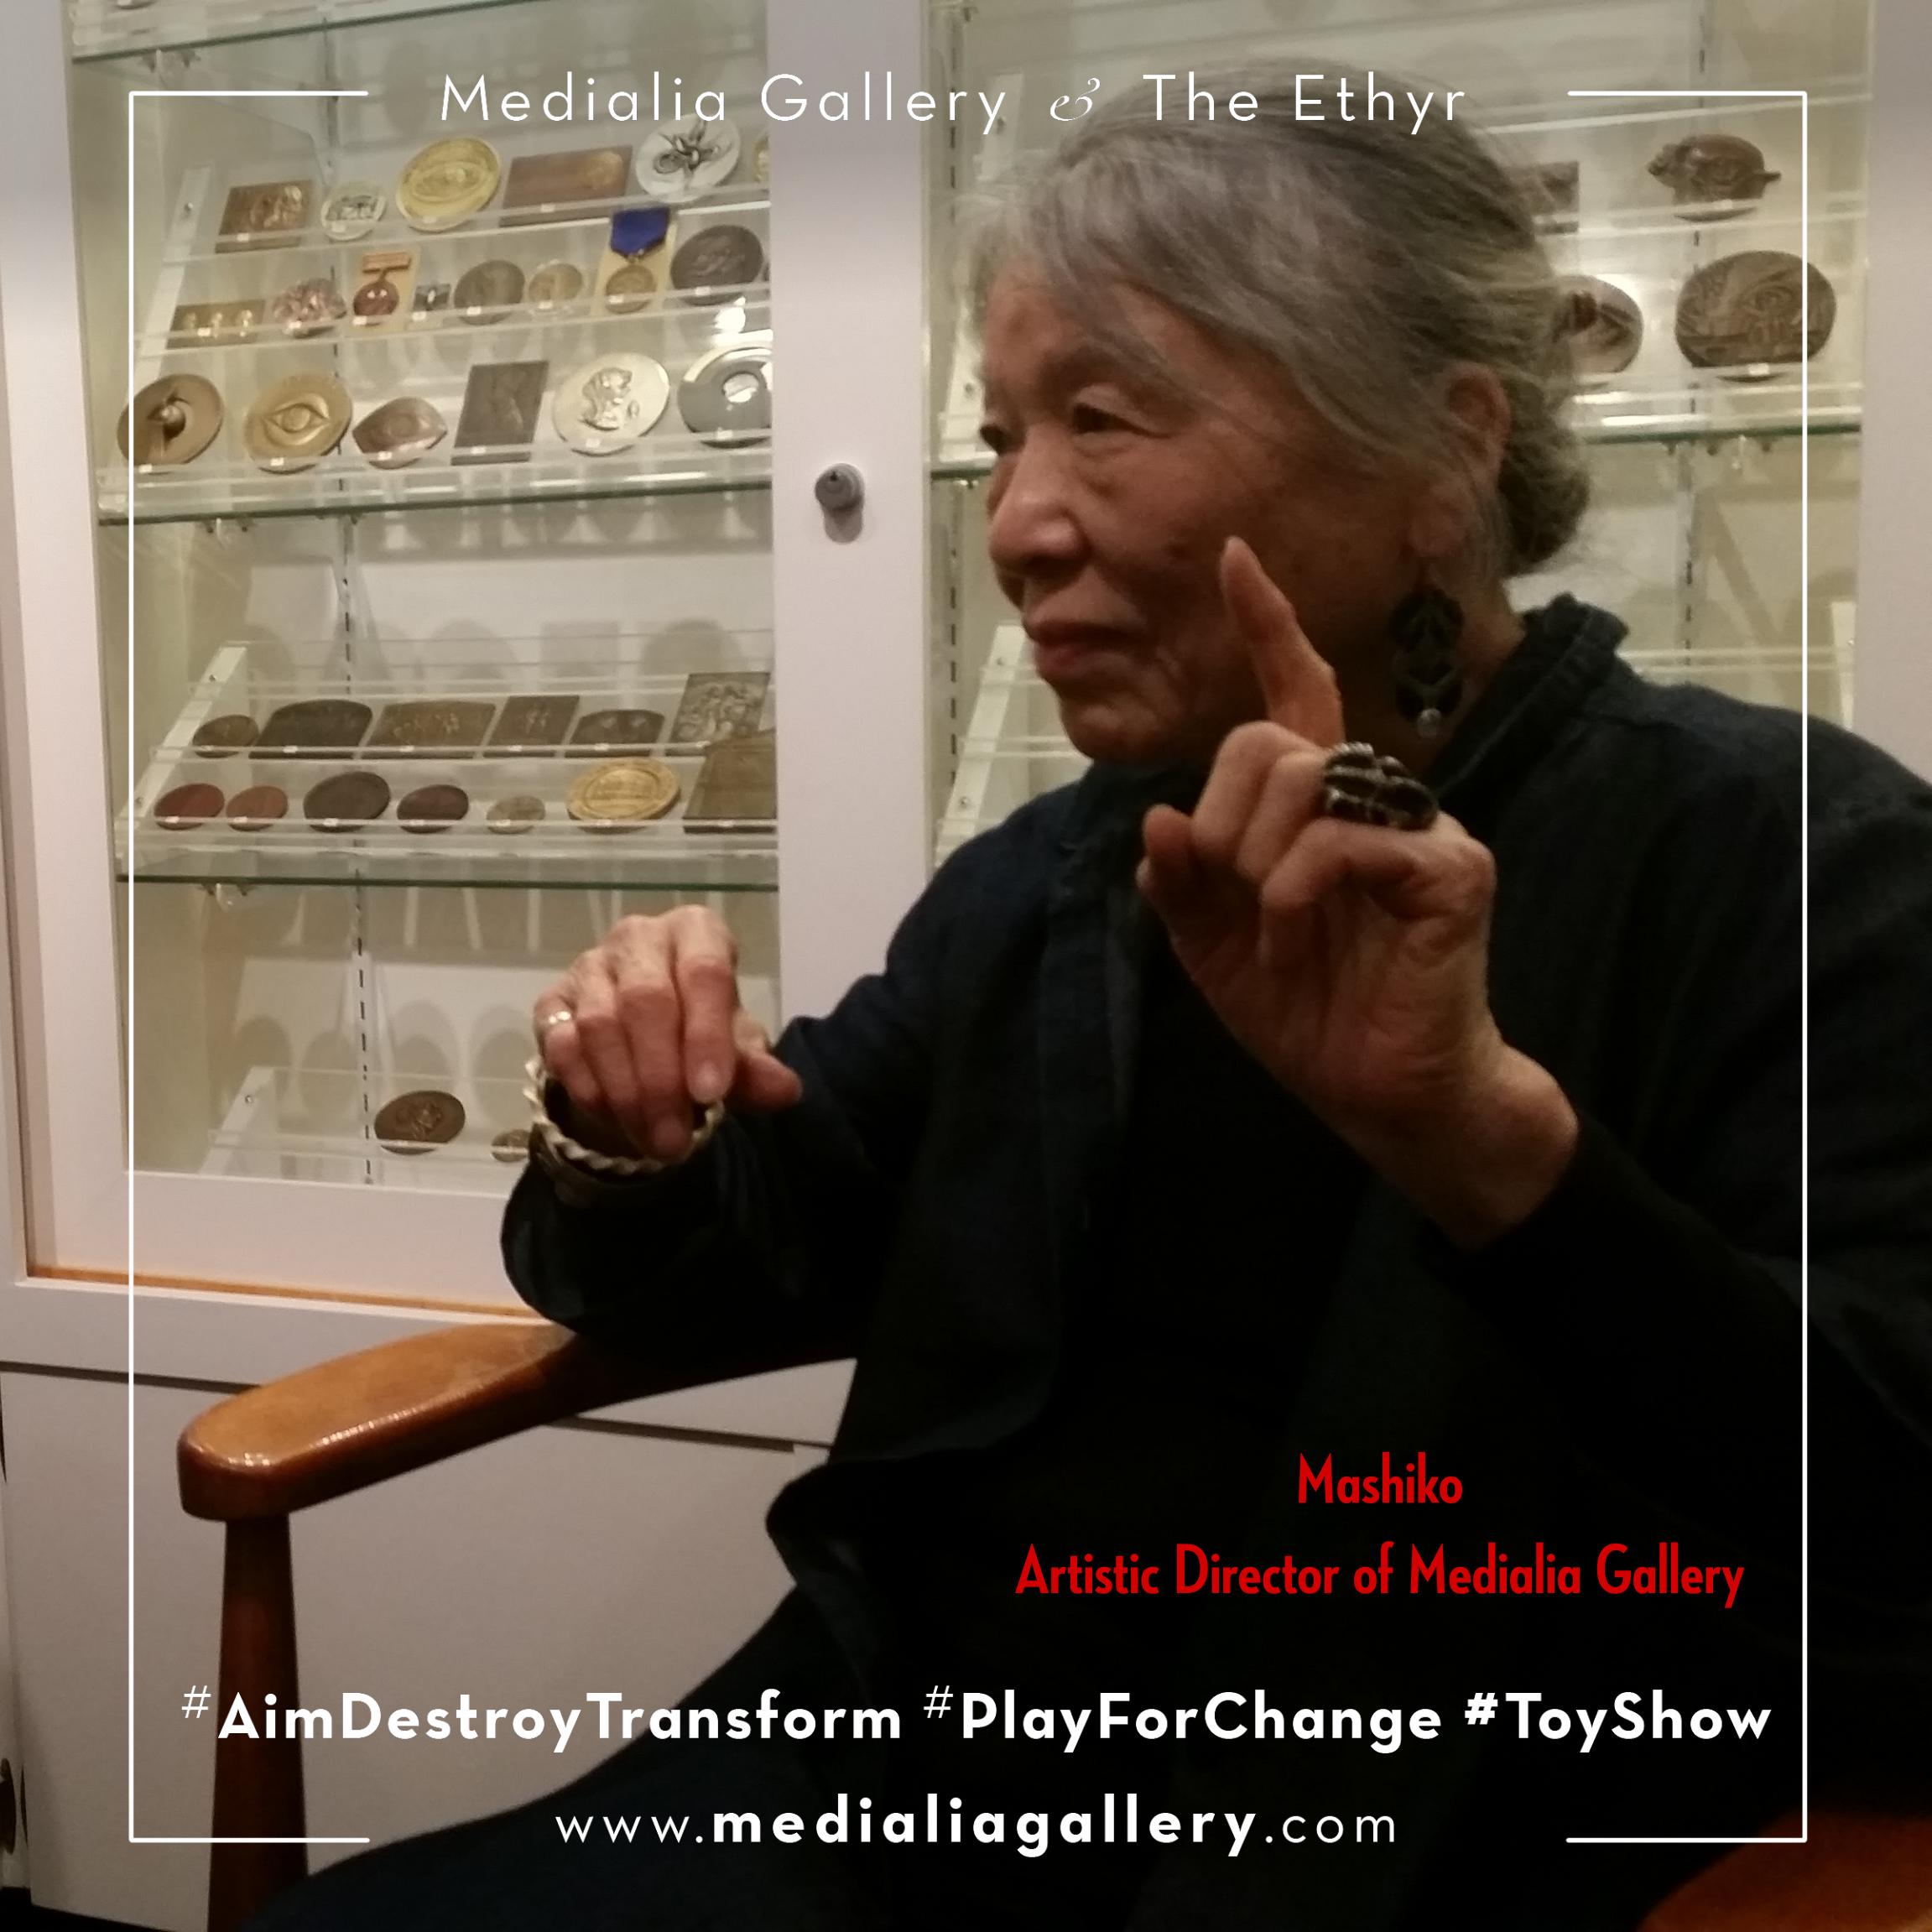 MedialiaGallery_The_Ethyr_AimDestroyTransform_Toy_Show_announcement_Mashiko_Artistic_Director_November_2017.jpg.png